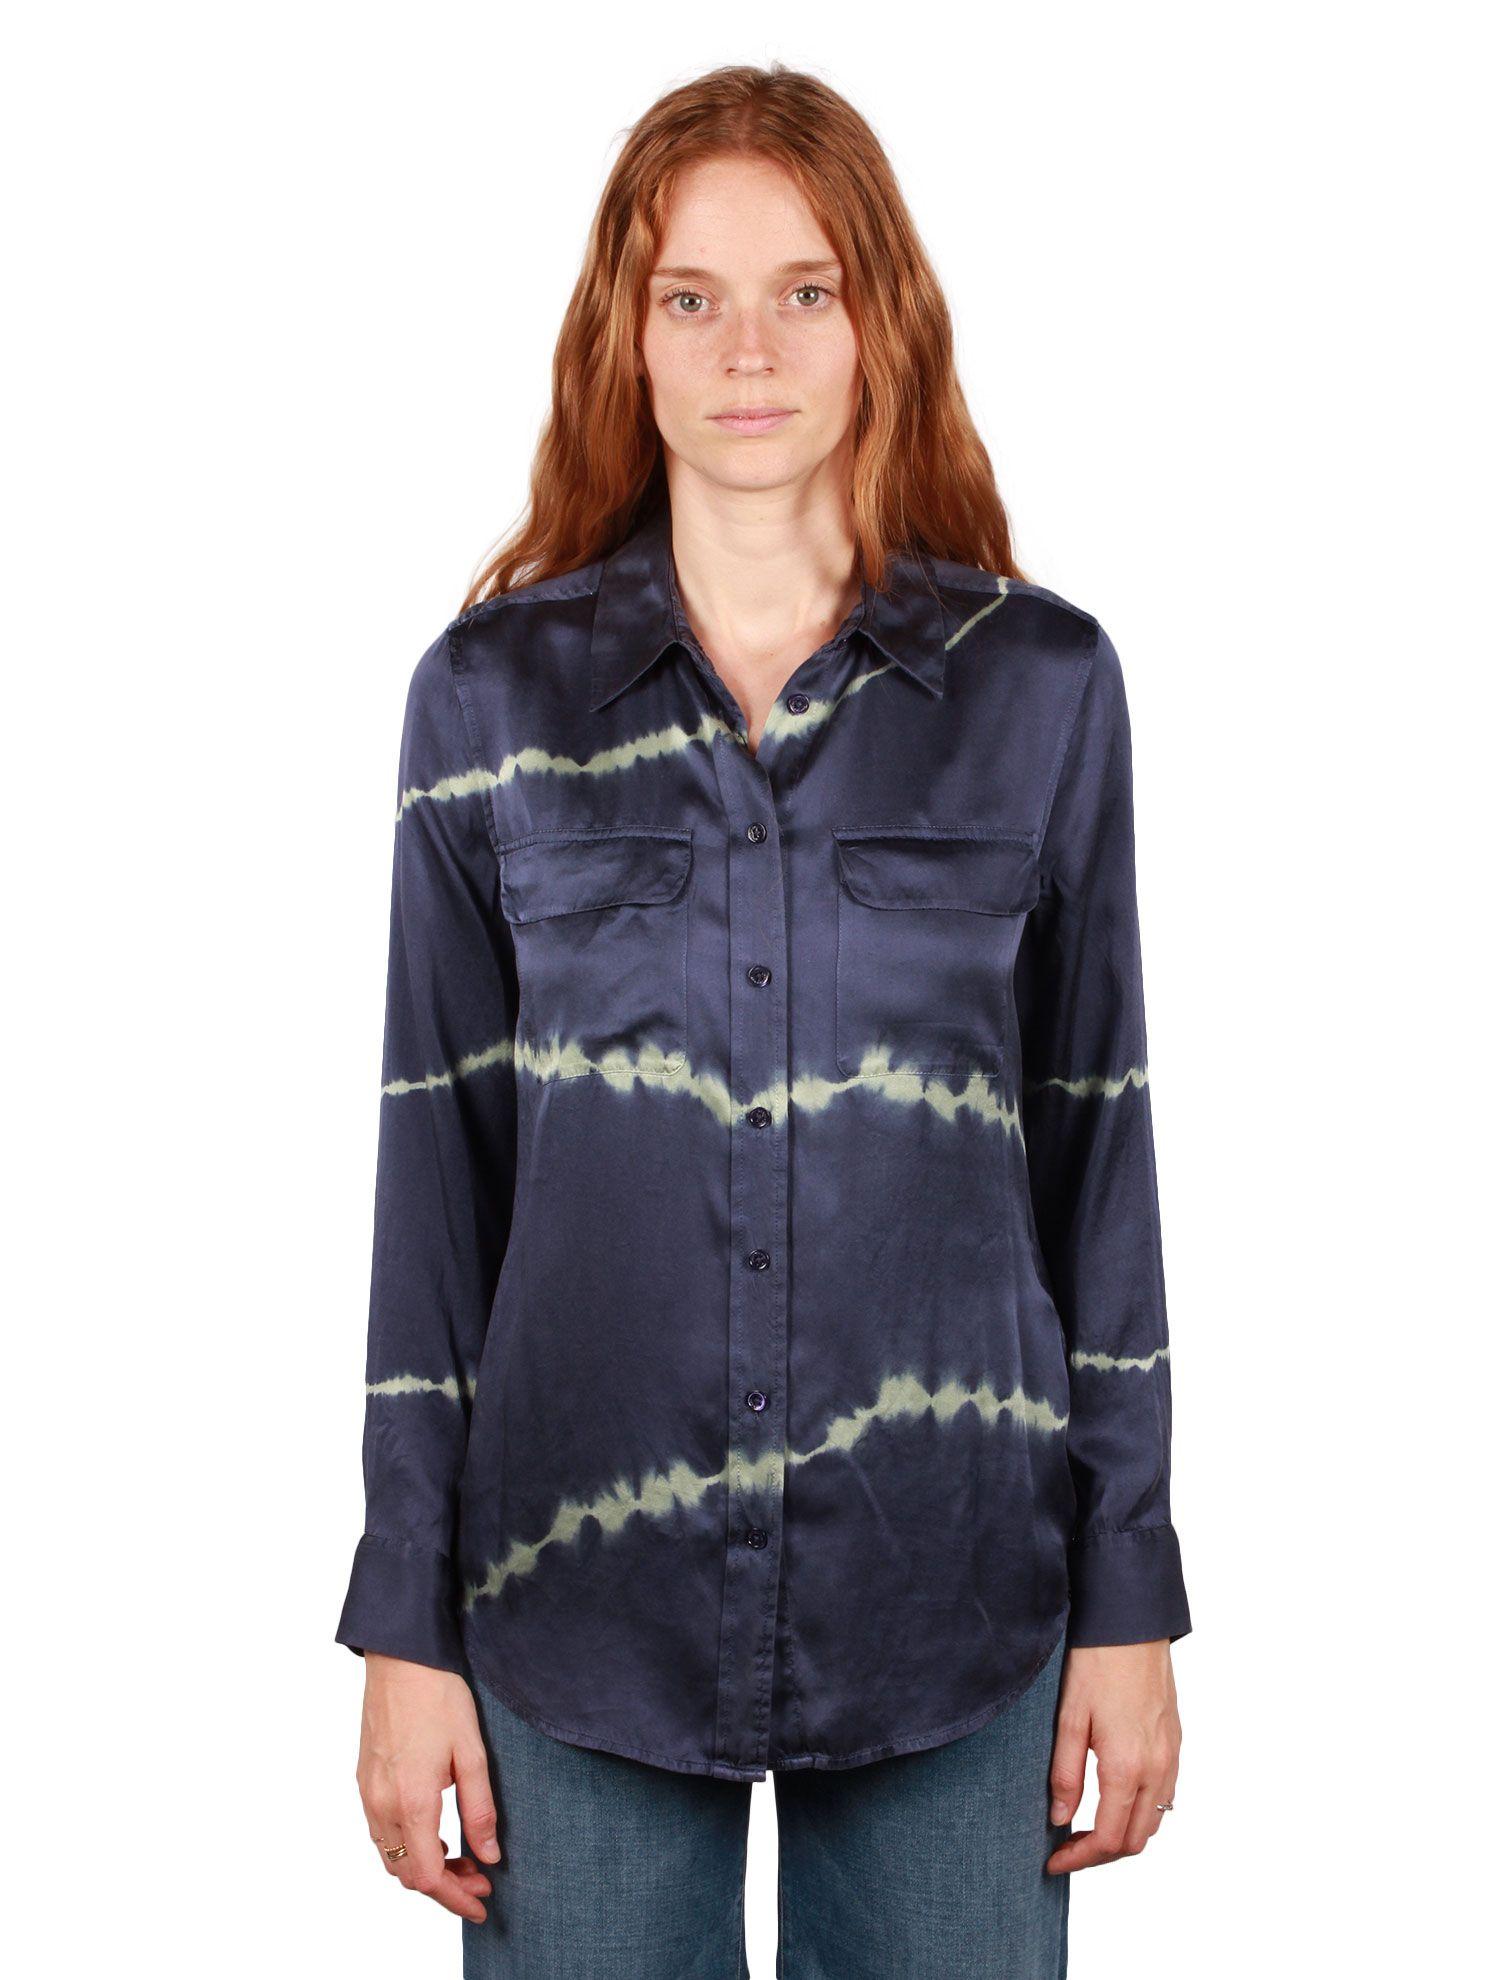 fe0569fafe femme-chemise-slim-signature-imprime-tie-and-dye-equipment-fw17.jpg